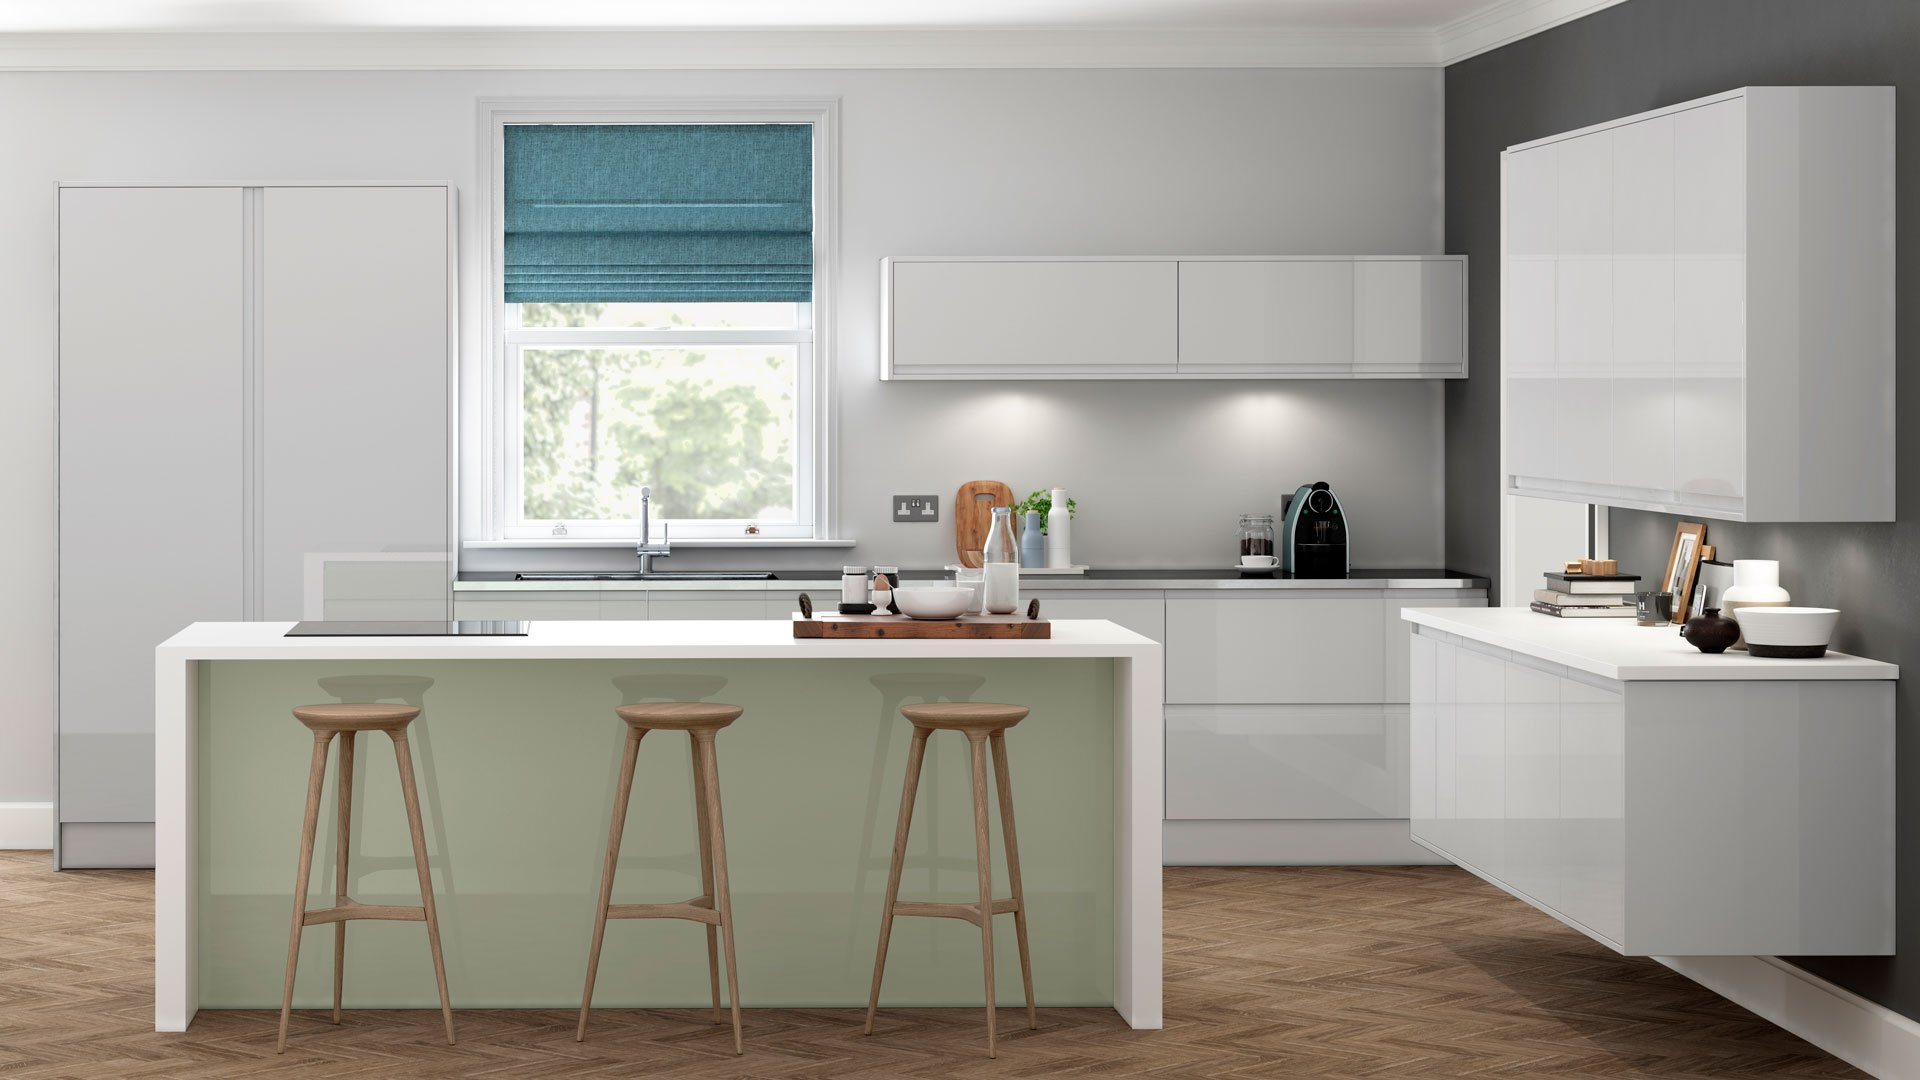 Multiwood Welford - Grey & Willow Kitchen